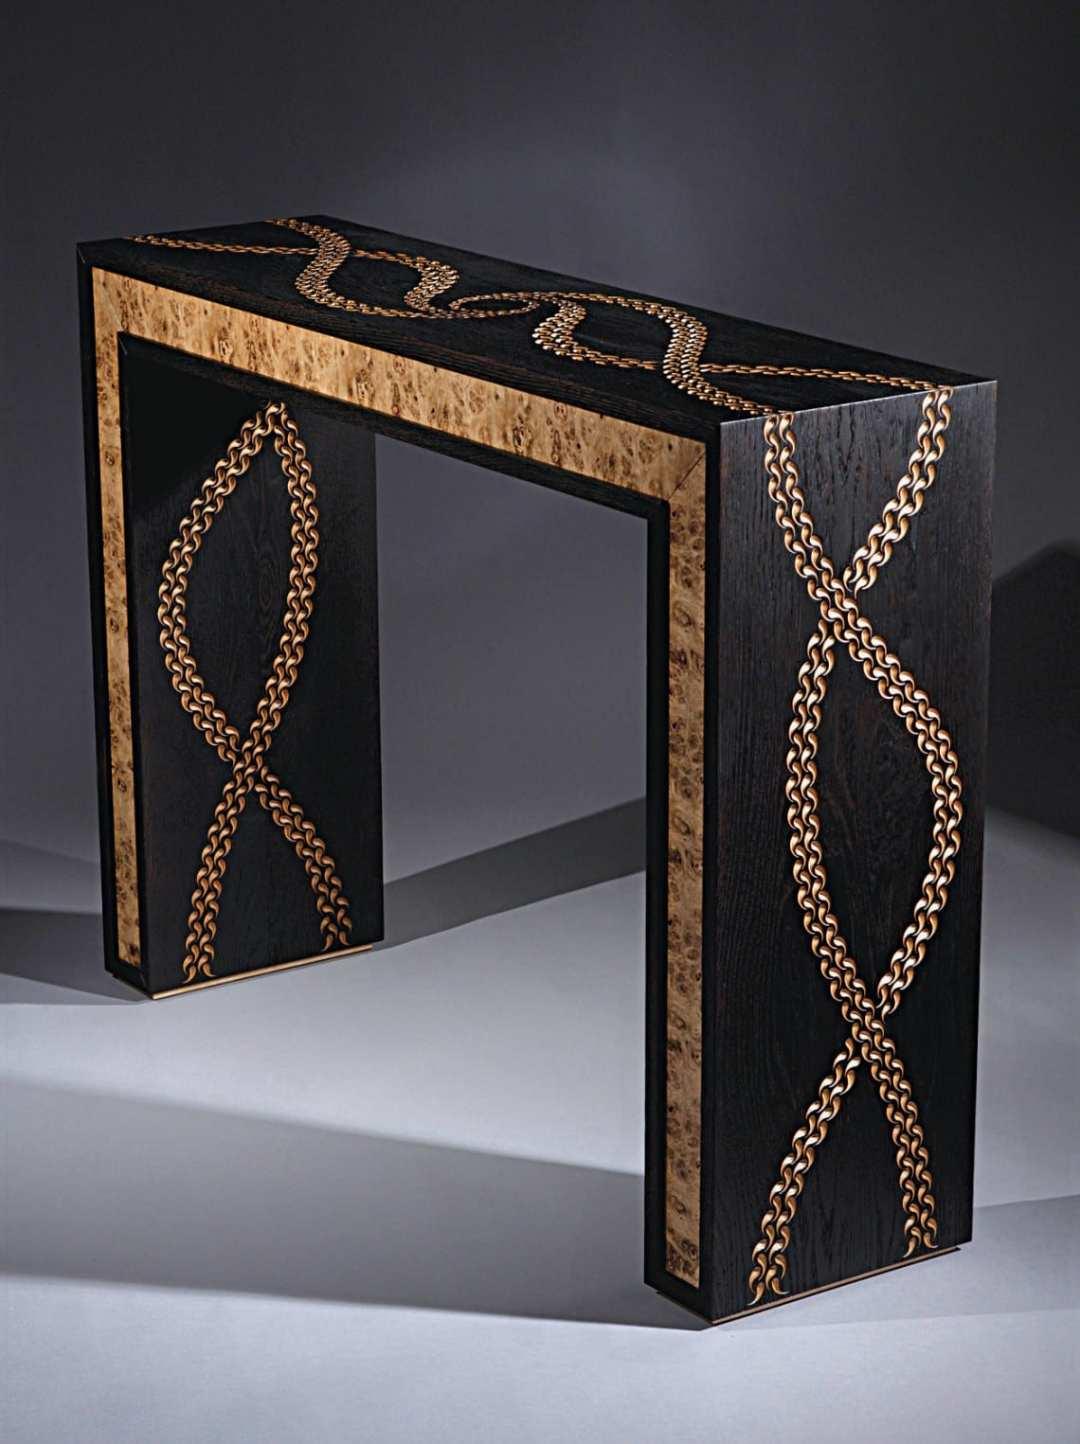 Création meuble bois brûlé avec gravures